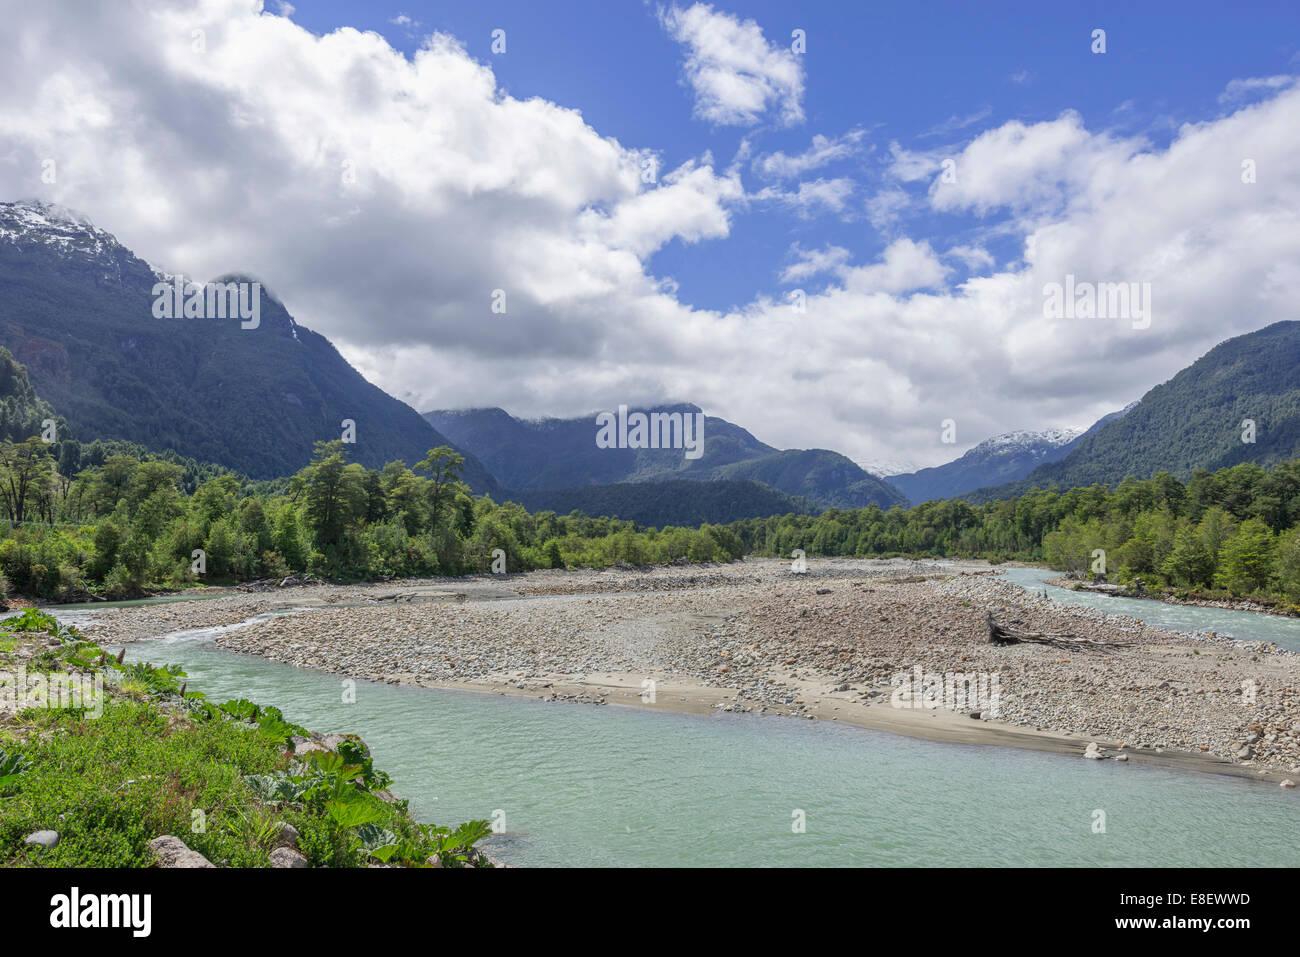 Rio Ventisquero, Parc National Queulat, Puerto Puyuhuapi, Aysén, Chile - Stock Image